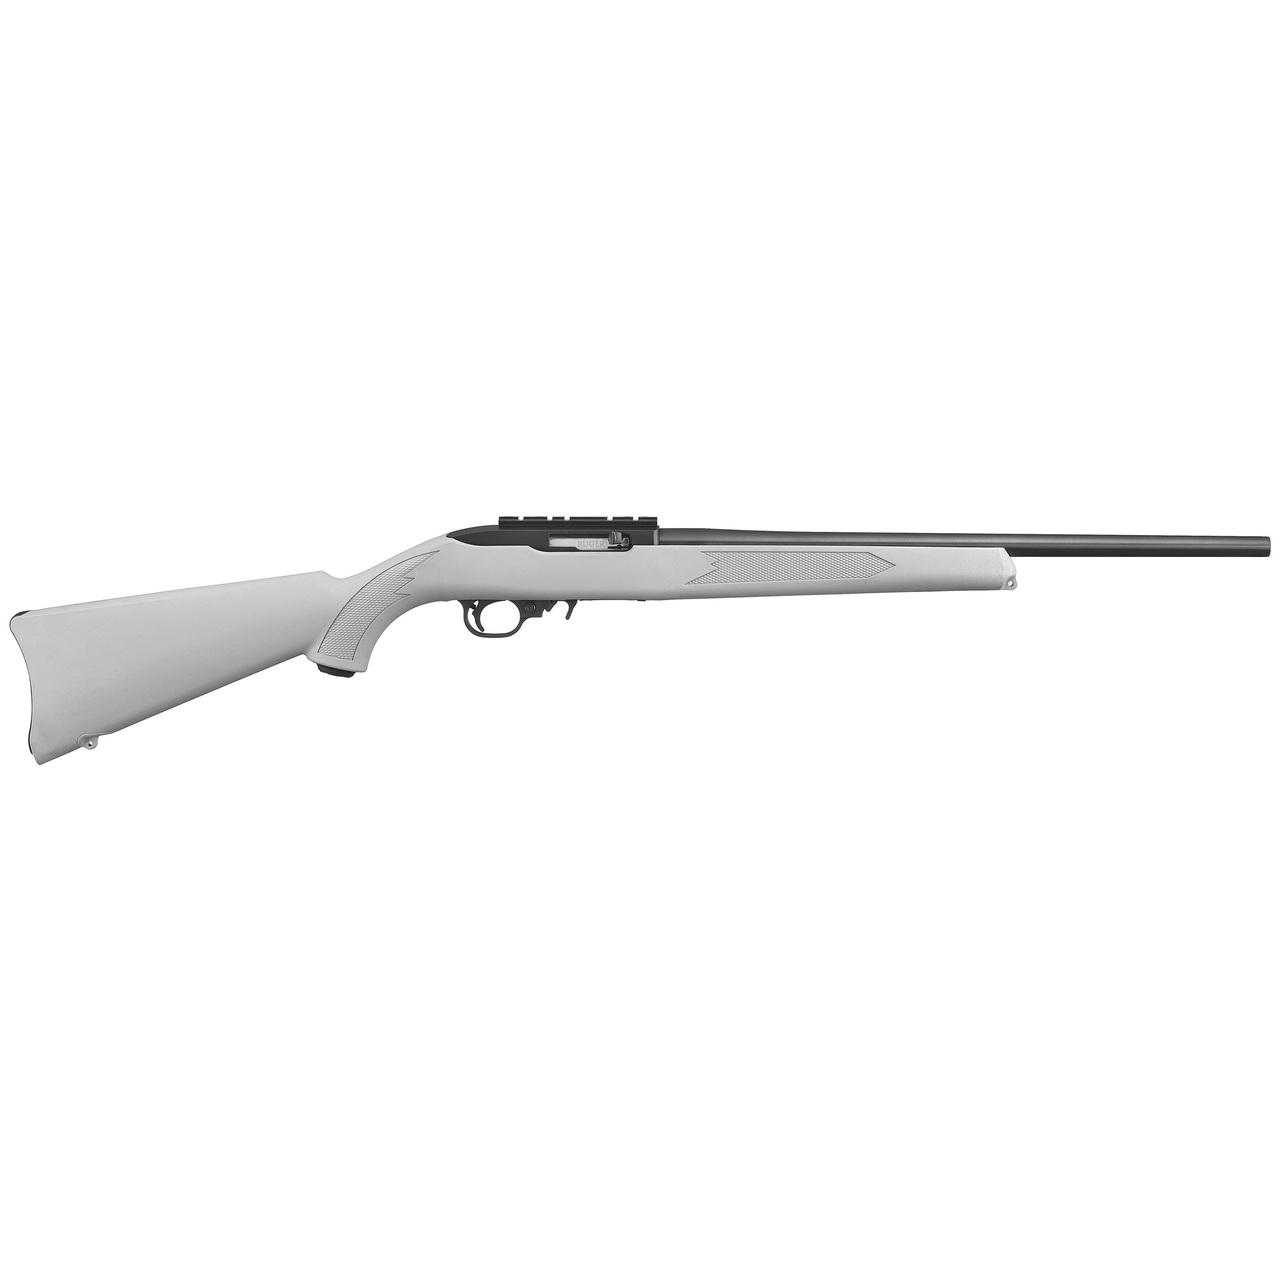 Ruger 10/22 Semi-automatic Carbine 22 LR